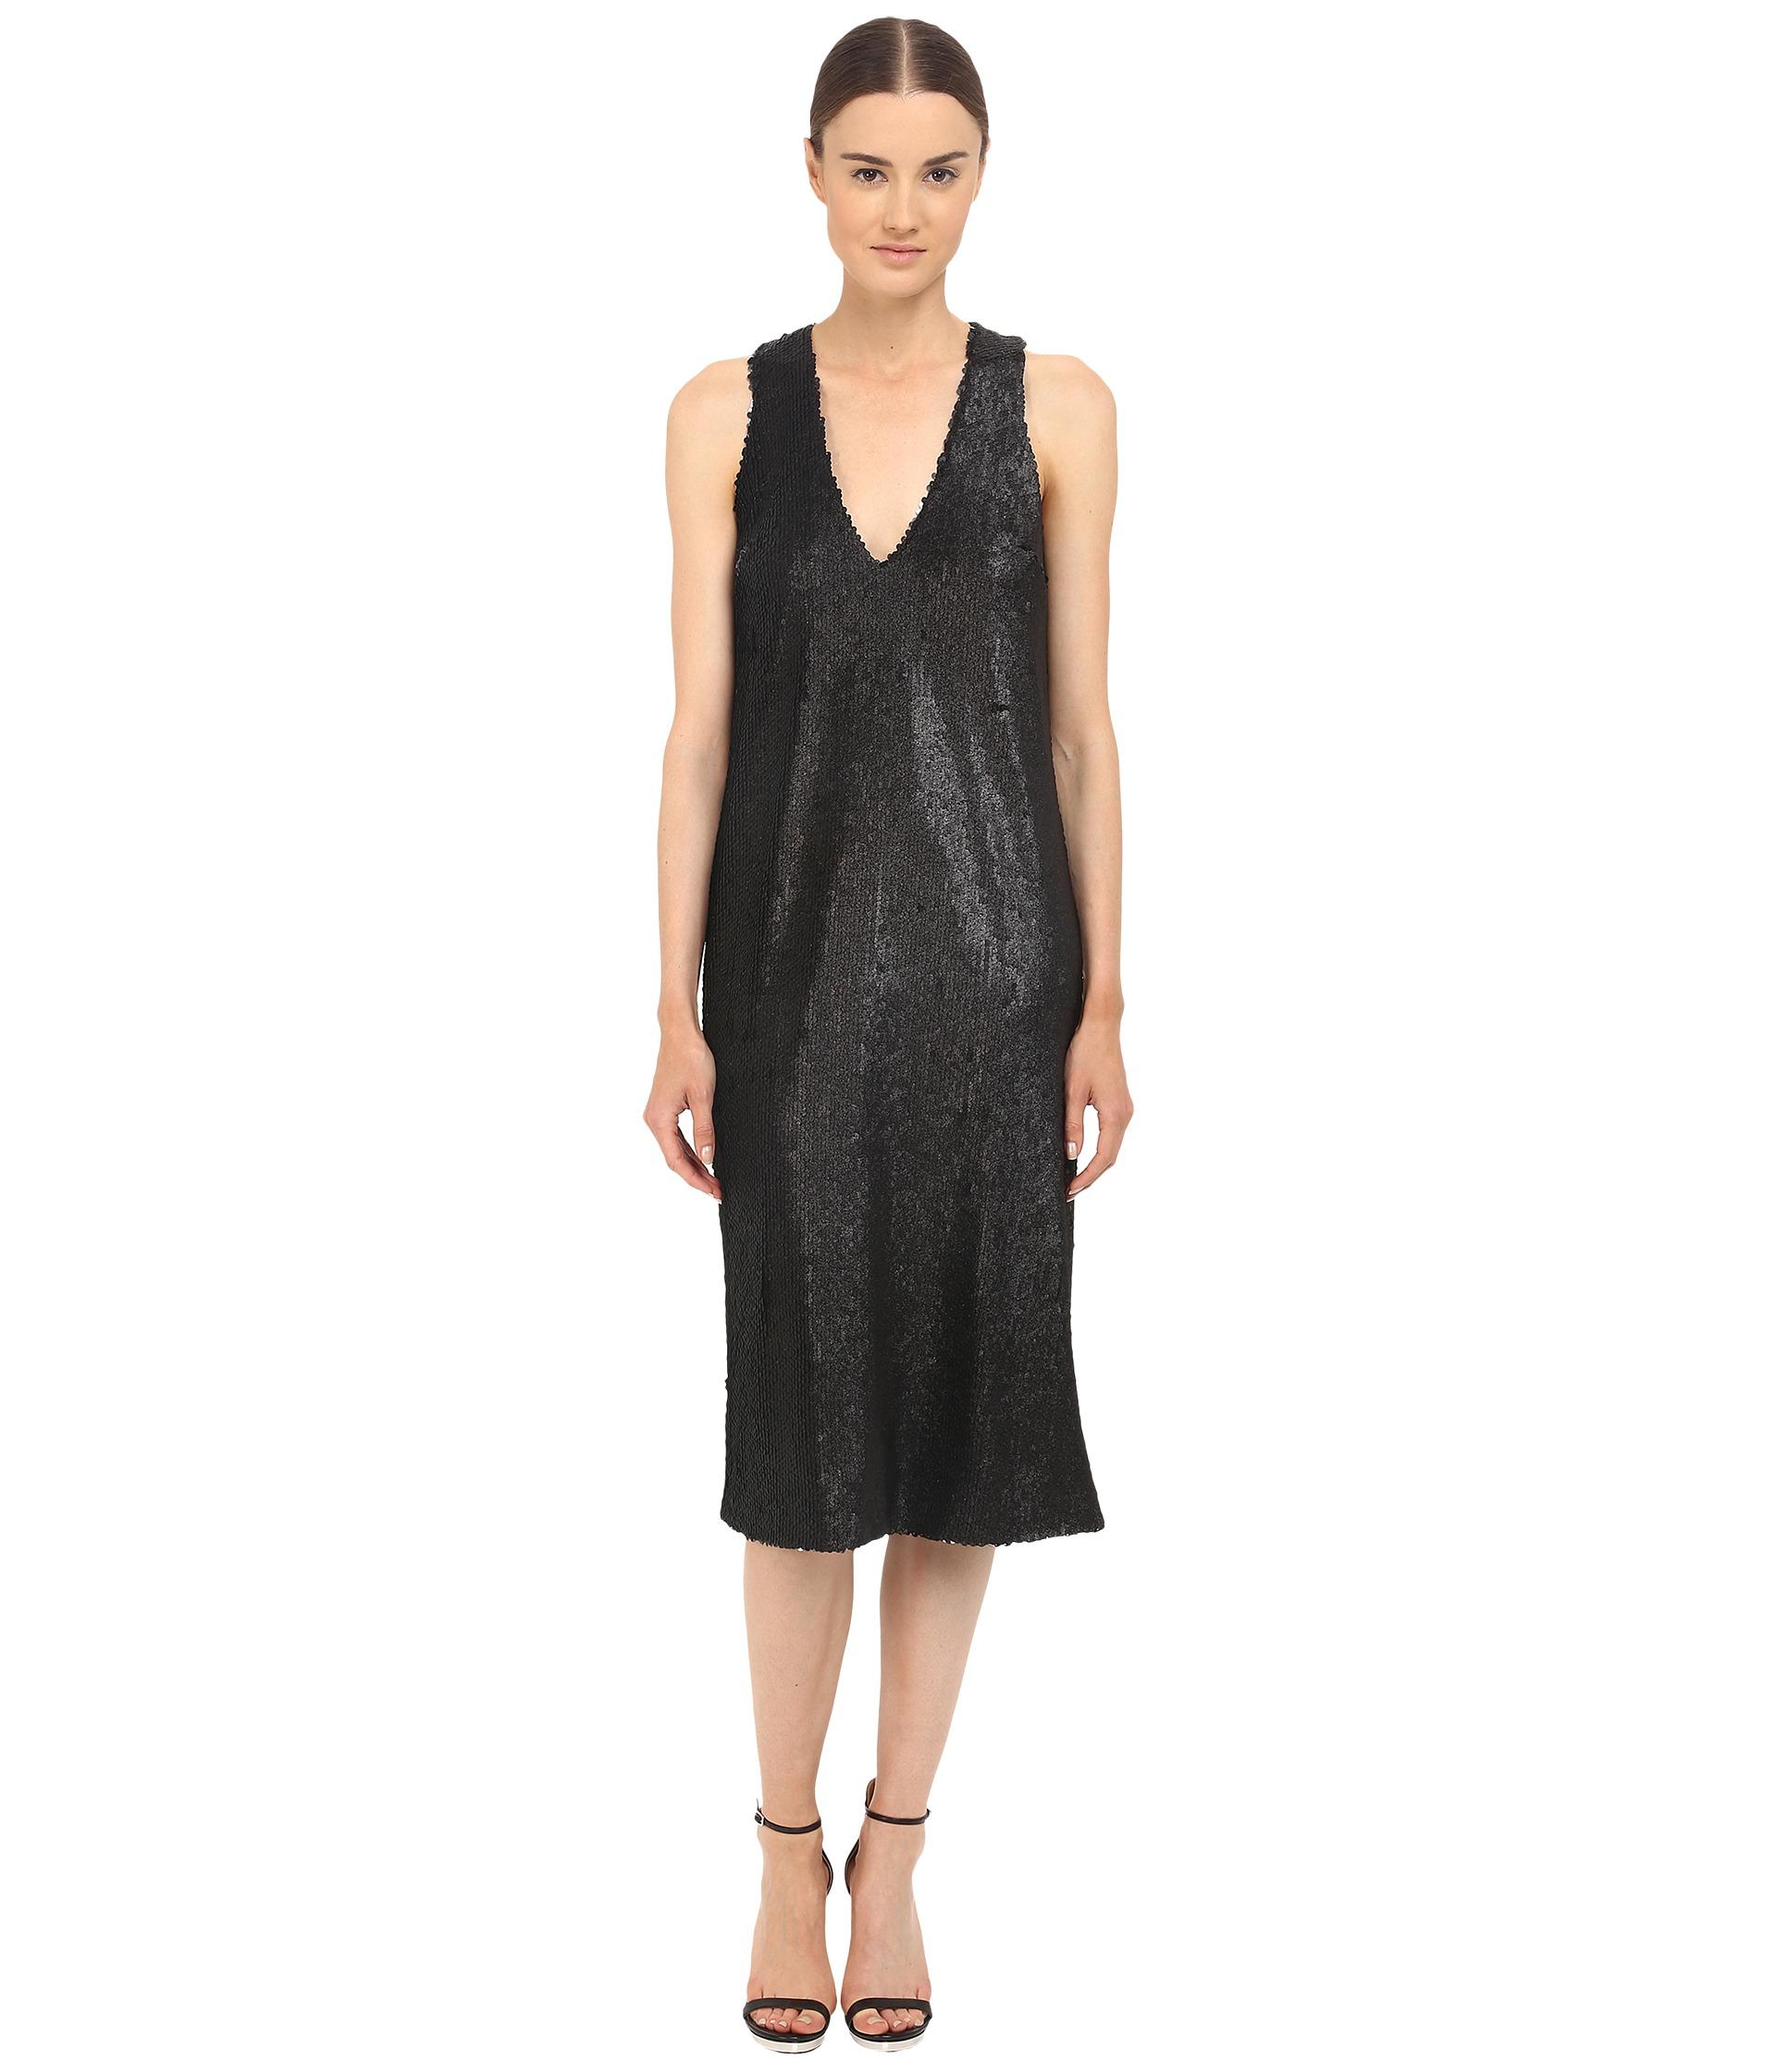 Prabal gurung Dusted Paillette Sleeveless Dress in Black | Lyst